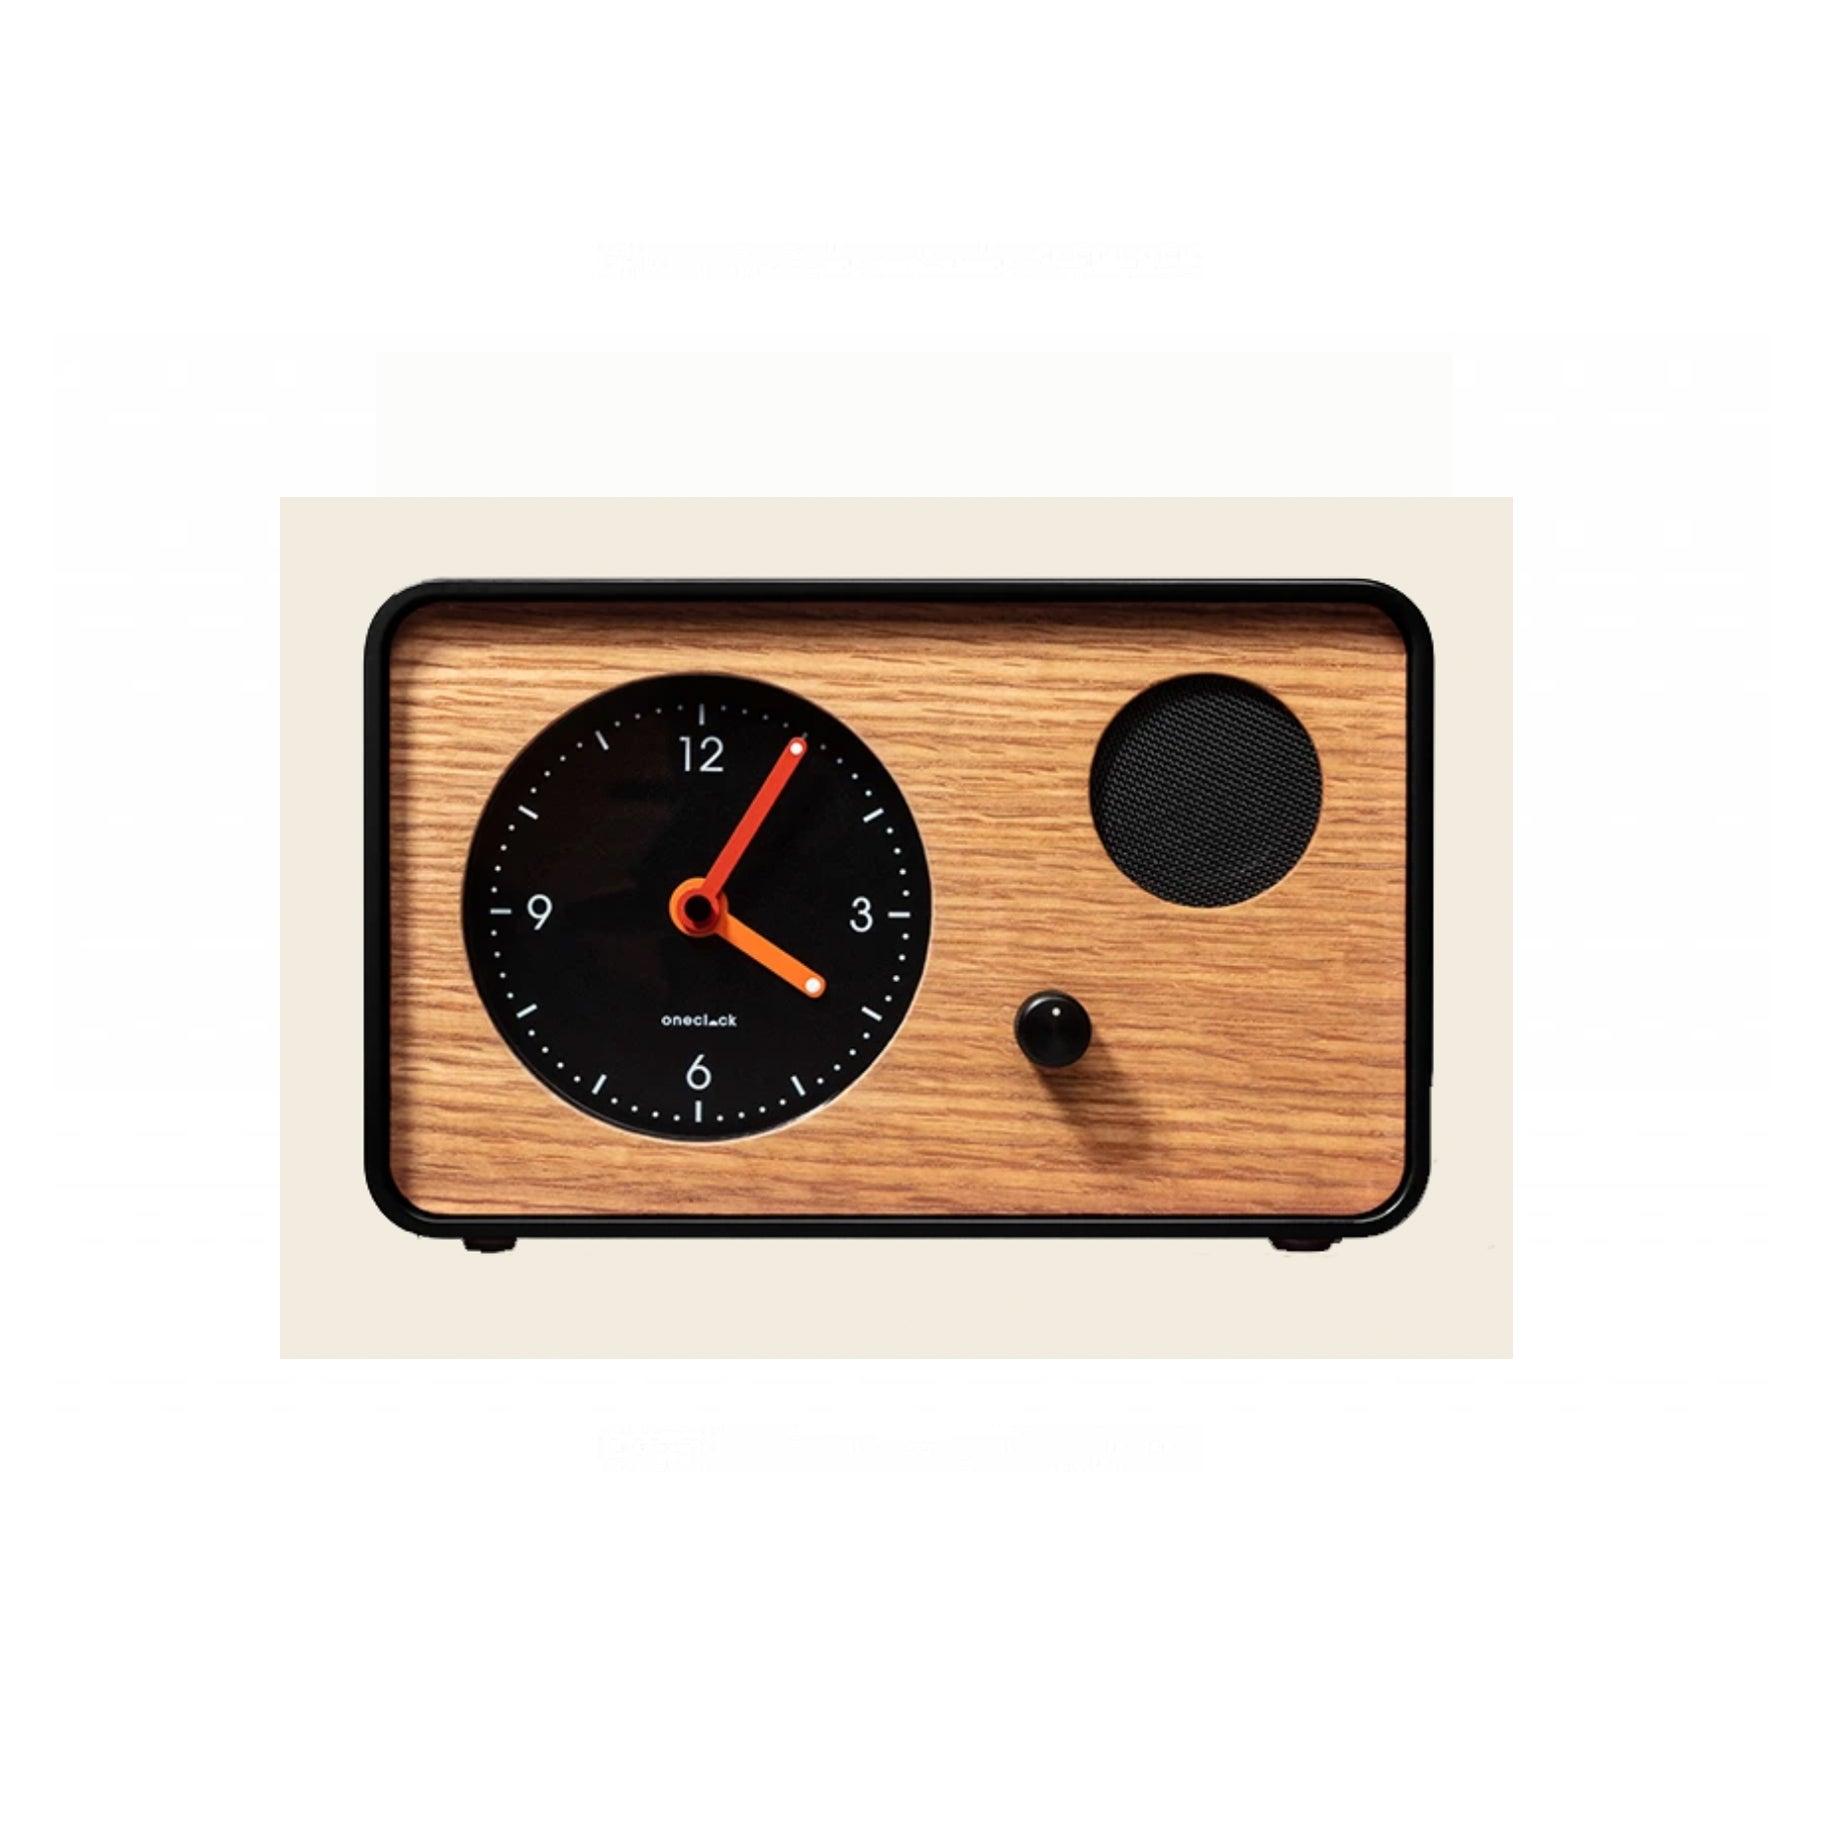 The-Best-Alarm-Clock-Option-Oneclock-Analog-Waking-Clock